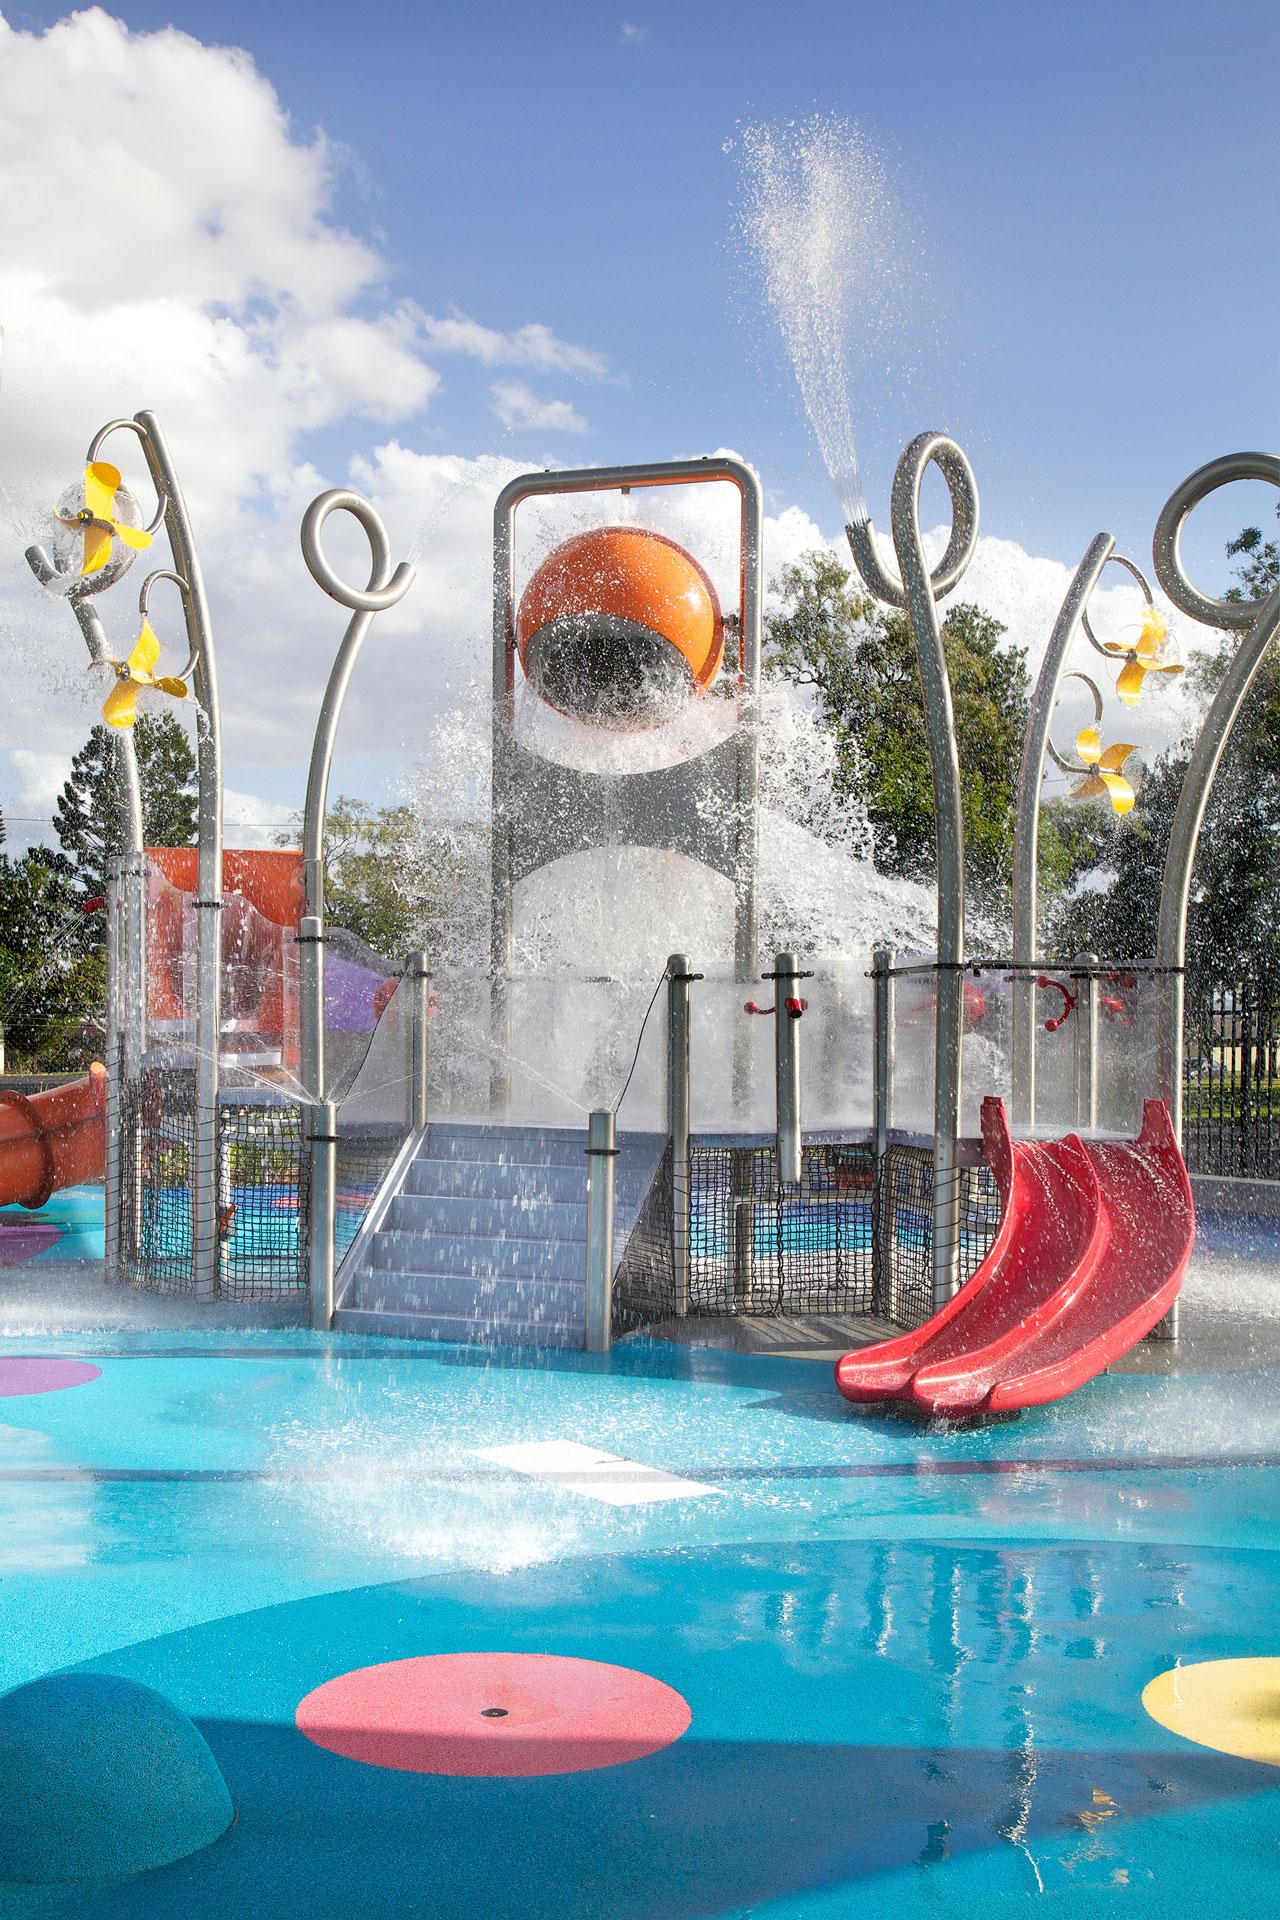 Greg Cruickshank Aquatic Centre